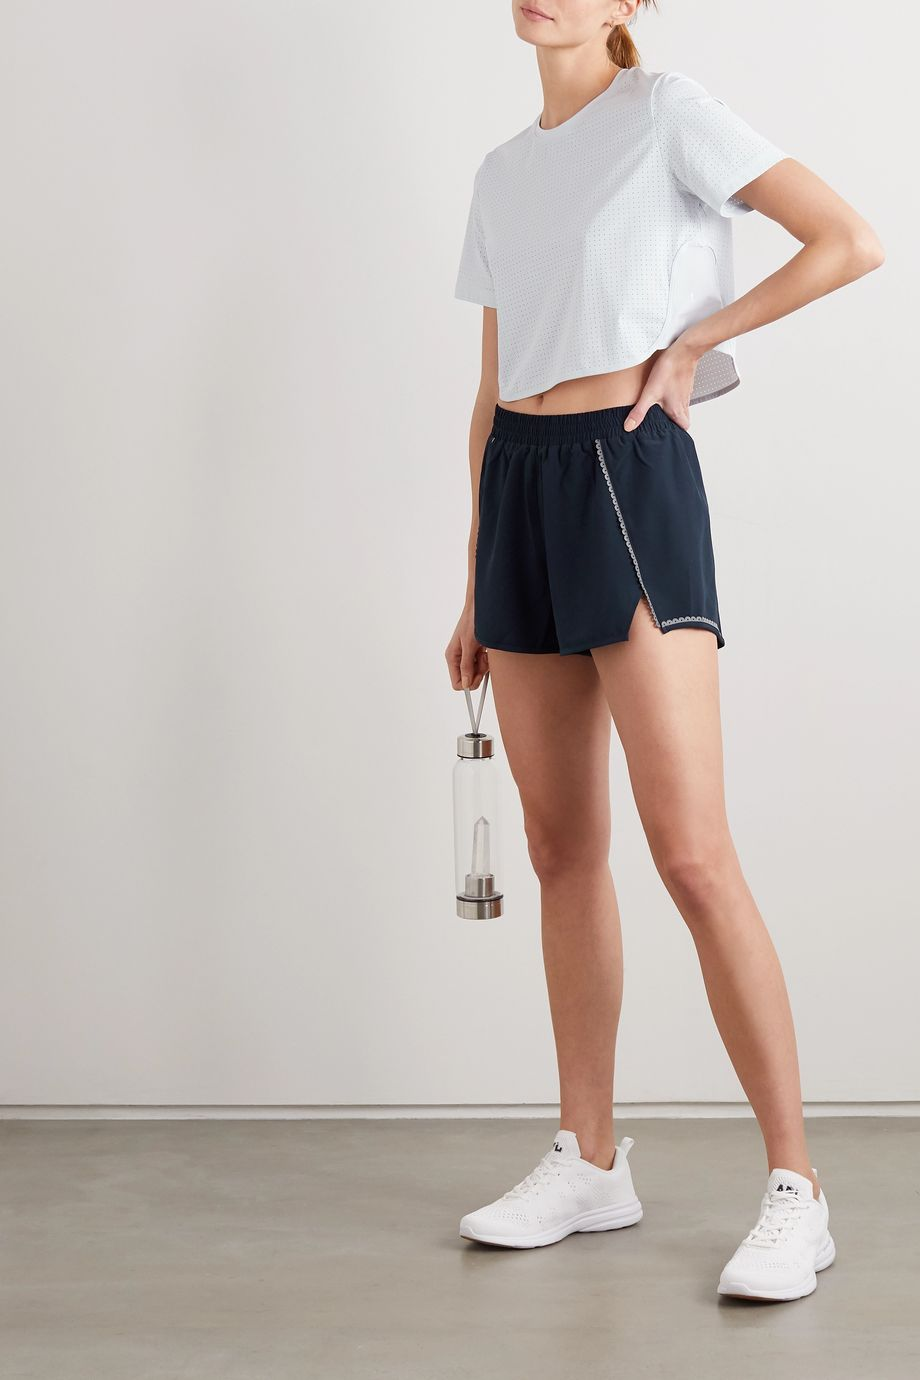 The Upside Blazen scalloped shell shorts